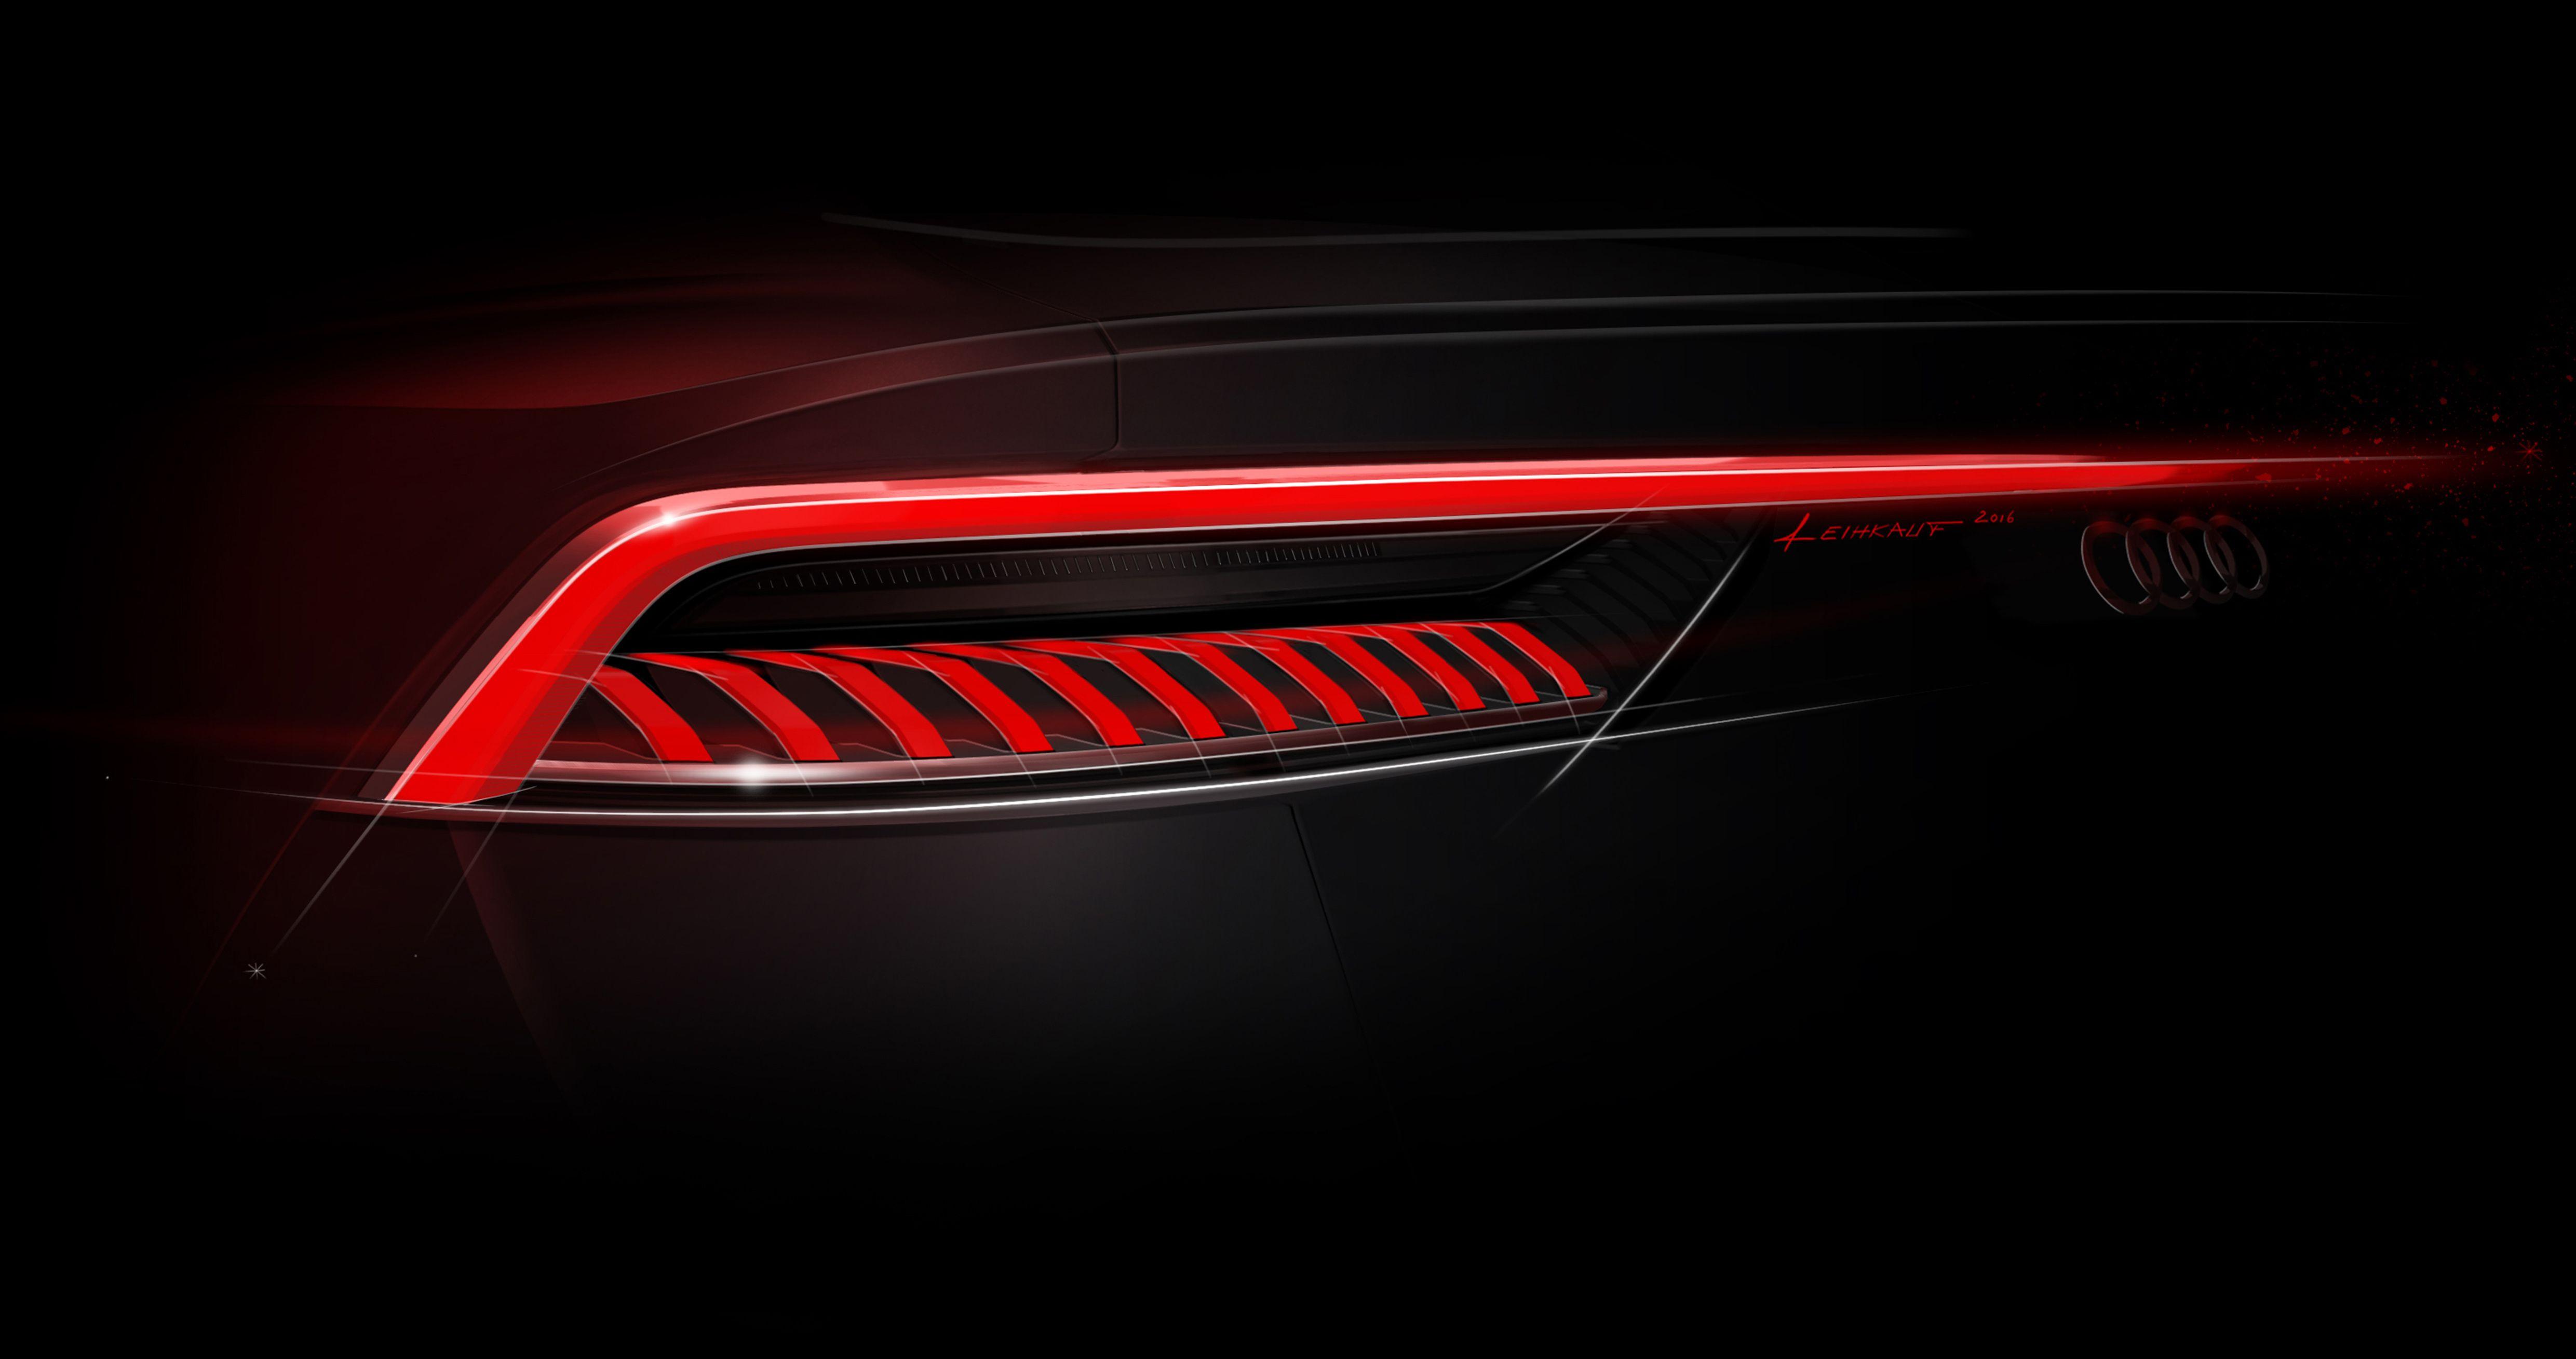 Audi Q8 Taillight Design Automotive Design Led Tail Lights Car Design Sketch